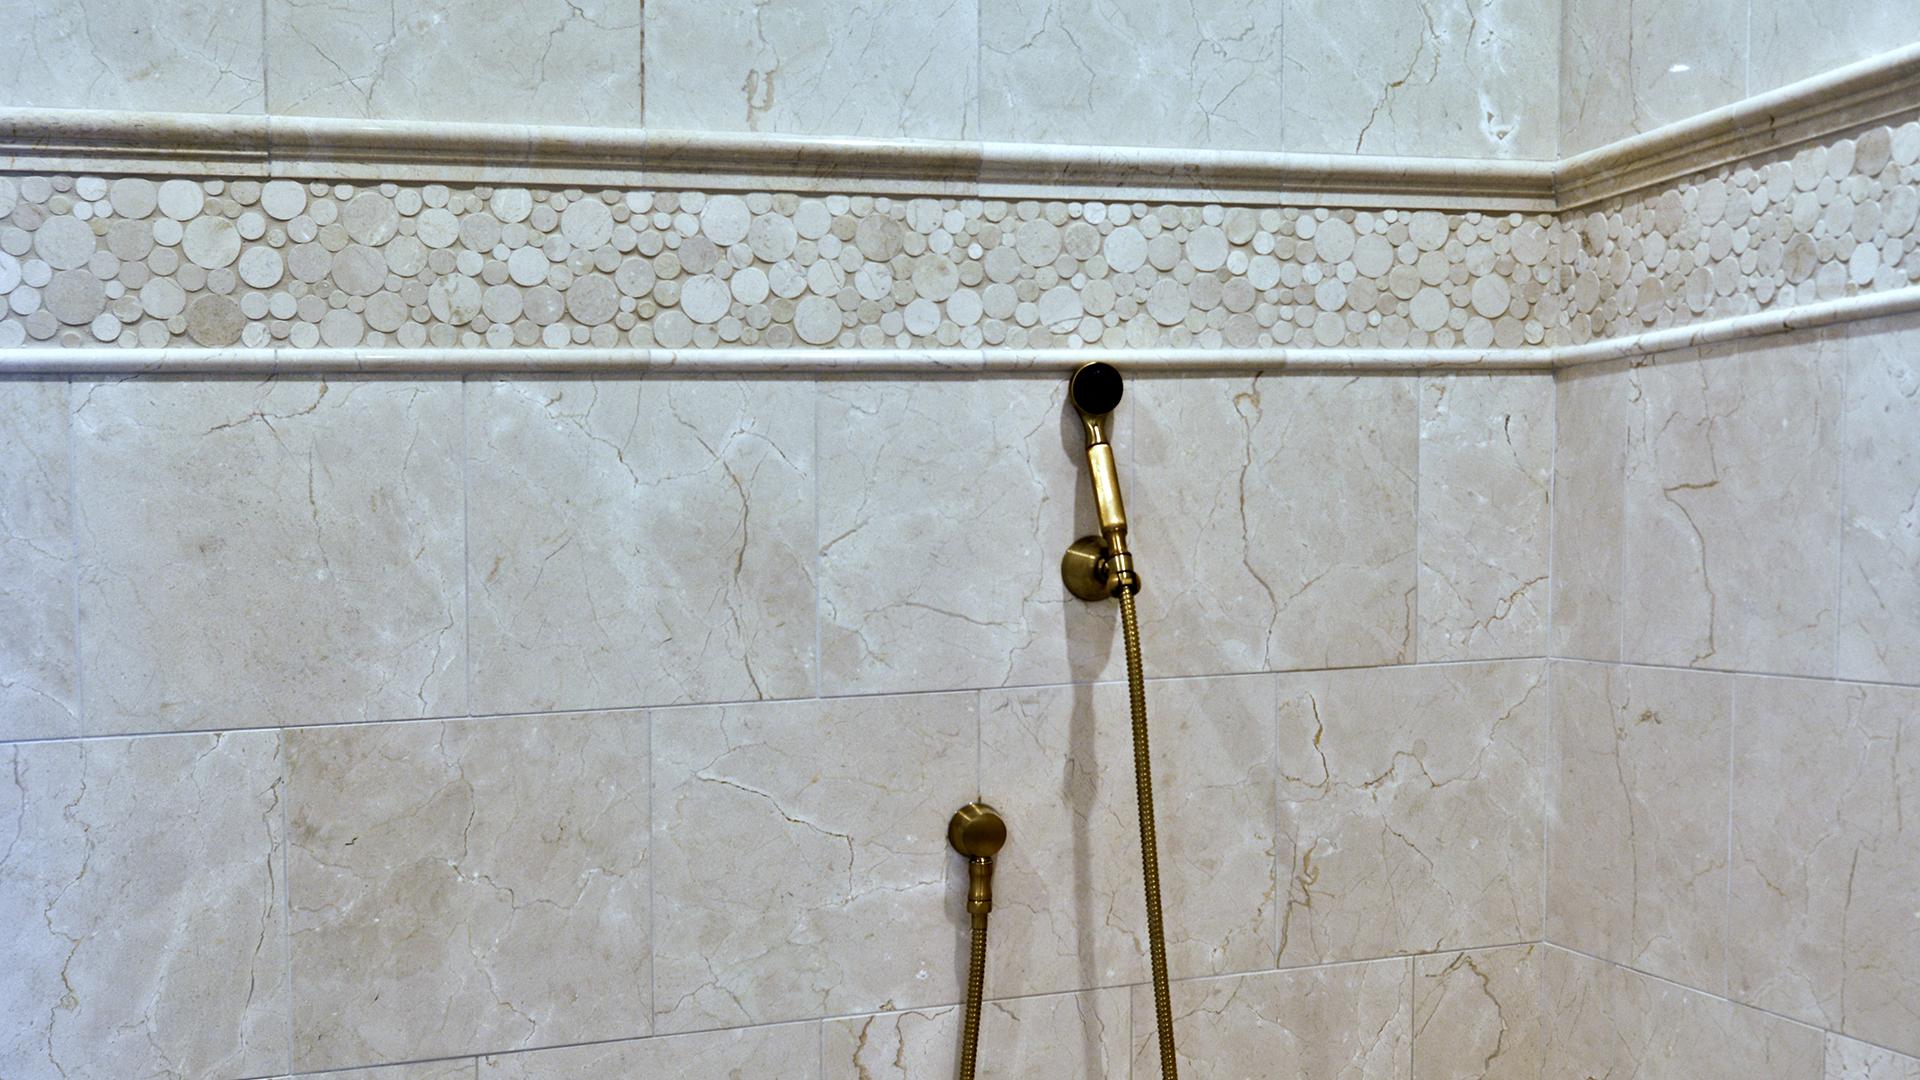 2019 NARI Capital CotY Grand Award Winner, Residential Bath Over $100,000